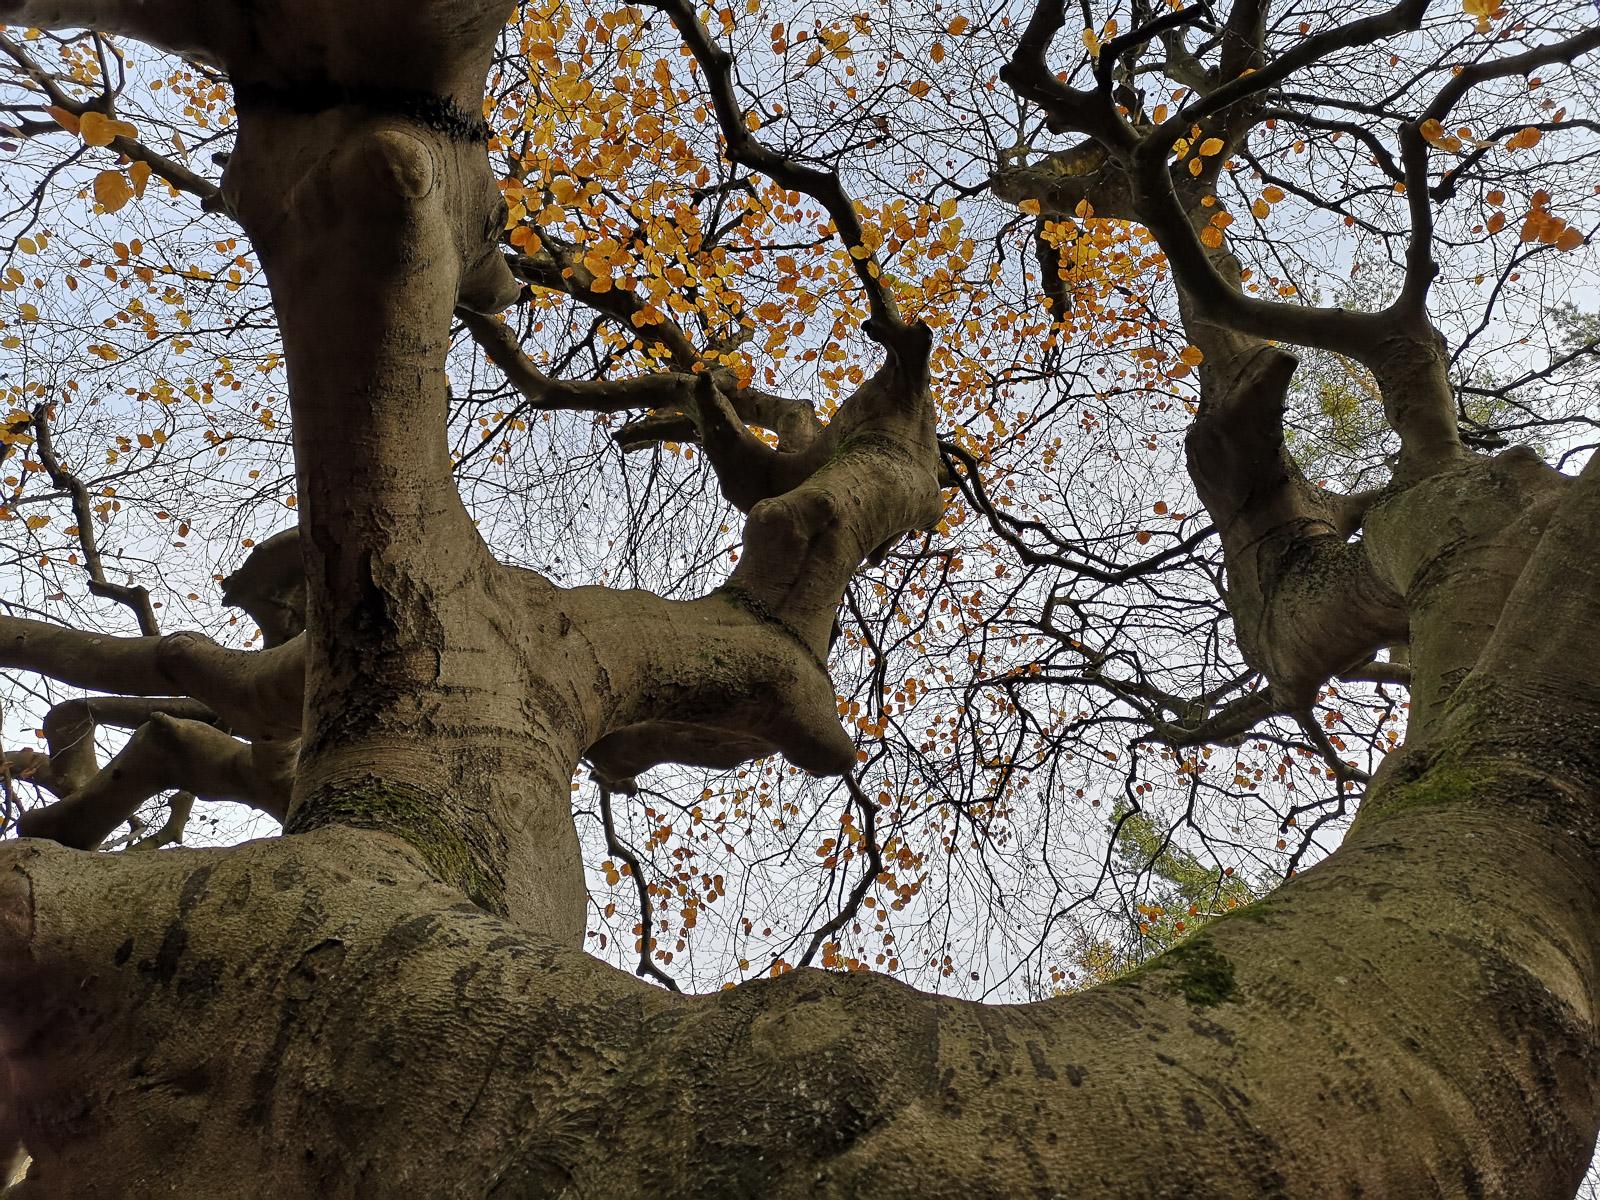 Auch der krumme dicke Baum hängt am Blatt (Foto: Reinhard Switala)